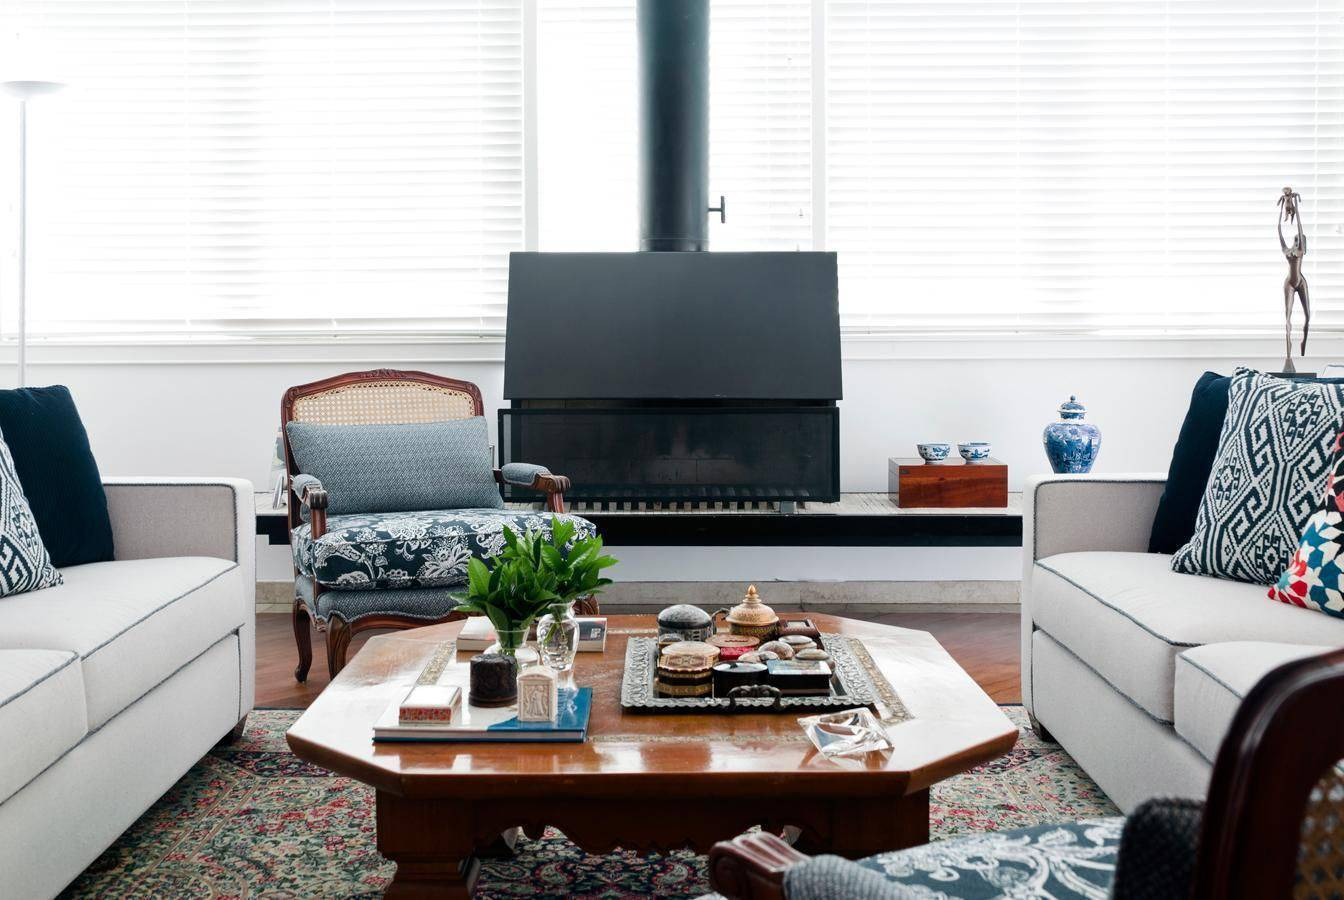 2897-sala-de-estar-morumbi-i-eunice-fernandes-viva-decora